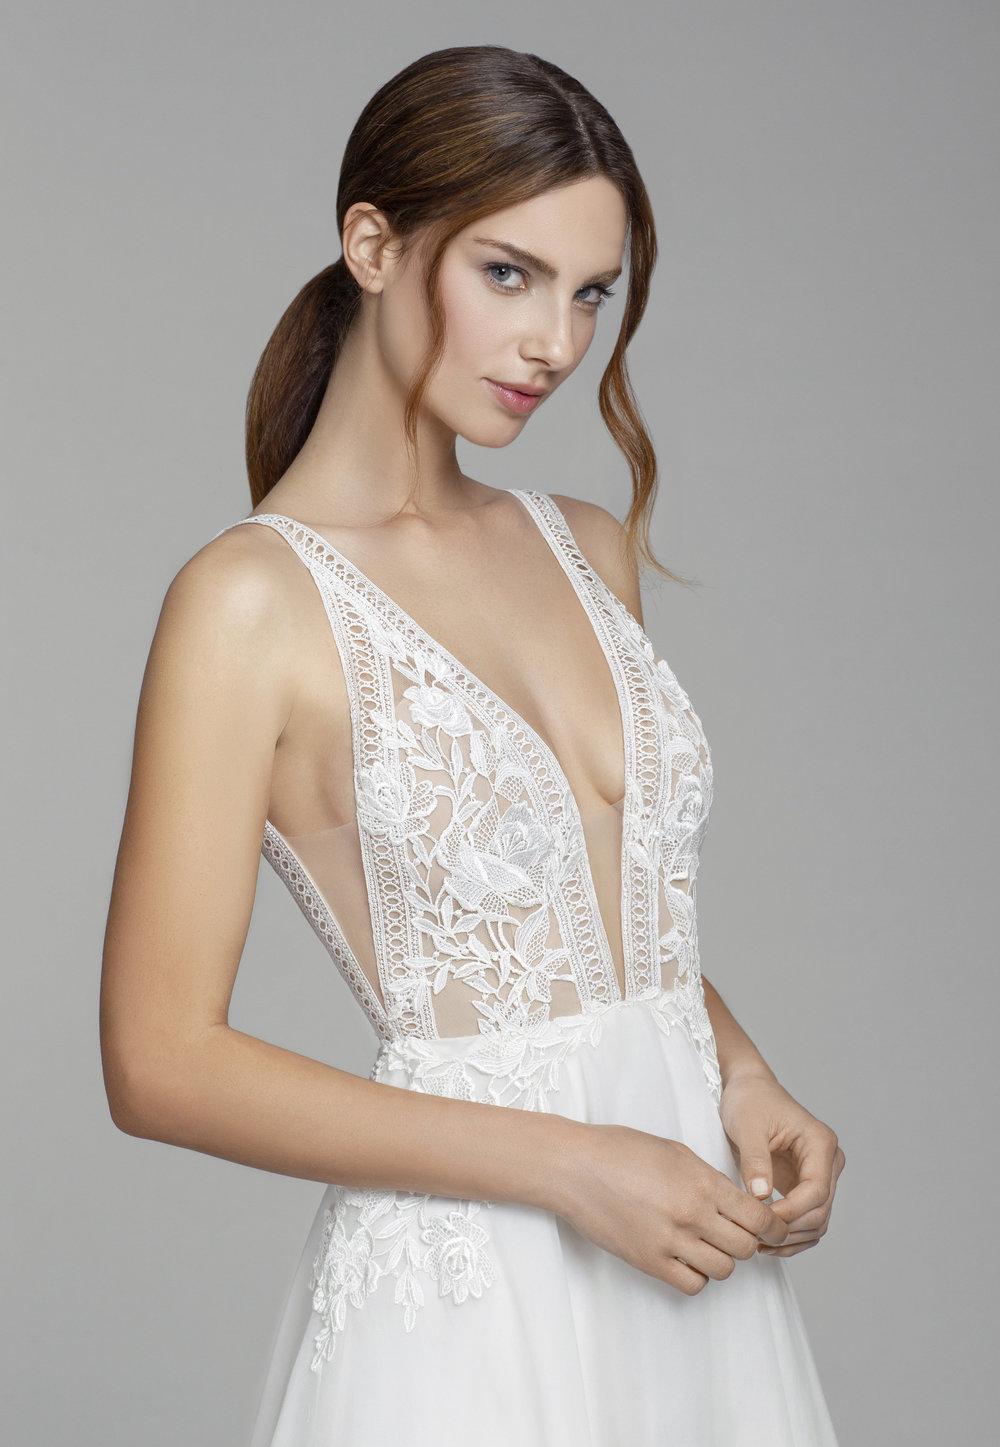 Style 2856: Cristina